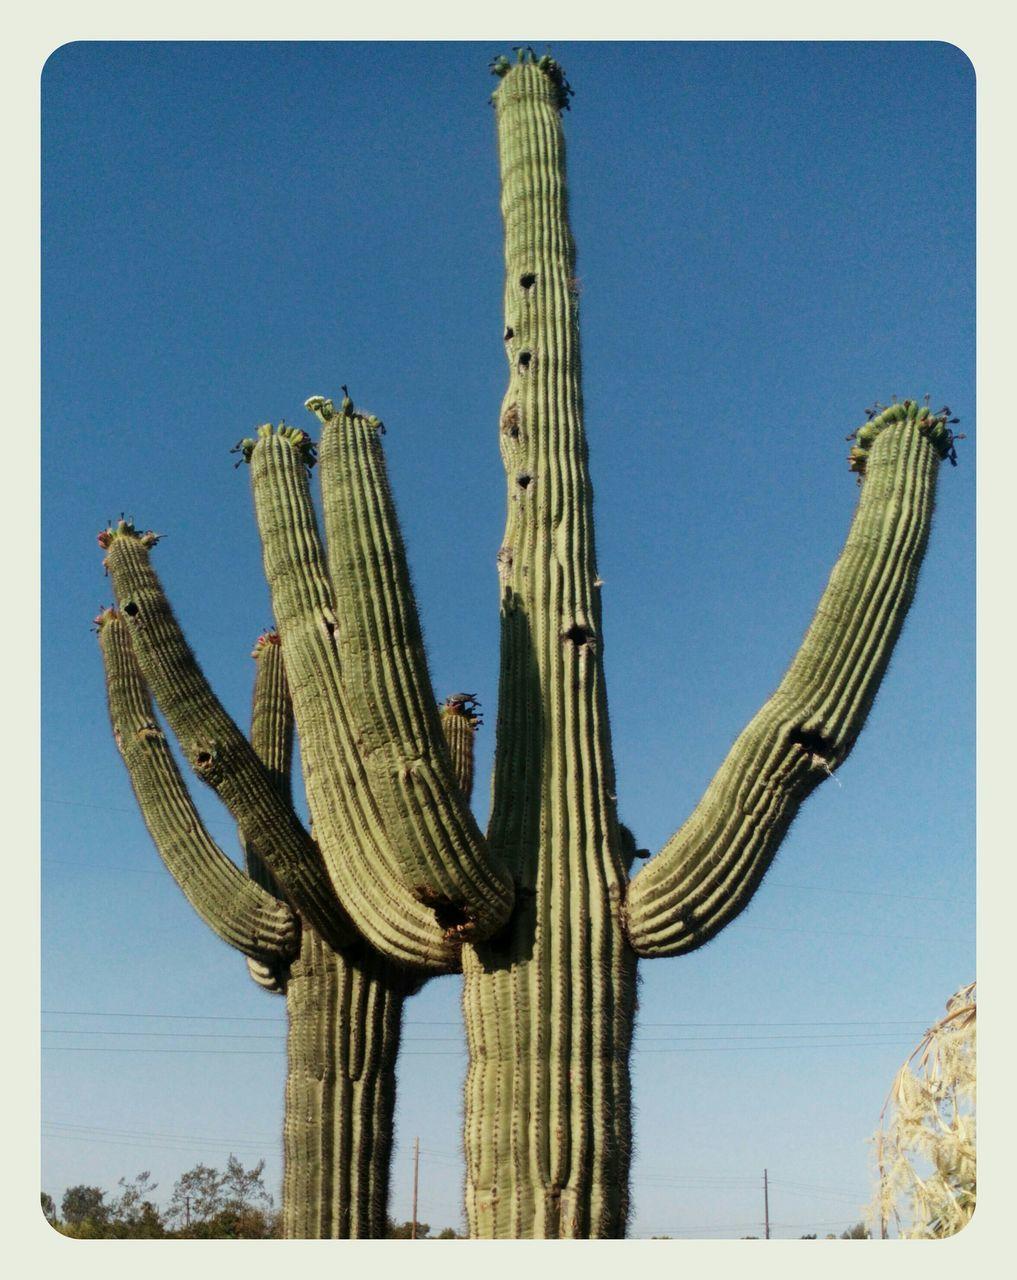 Cactus In Field